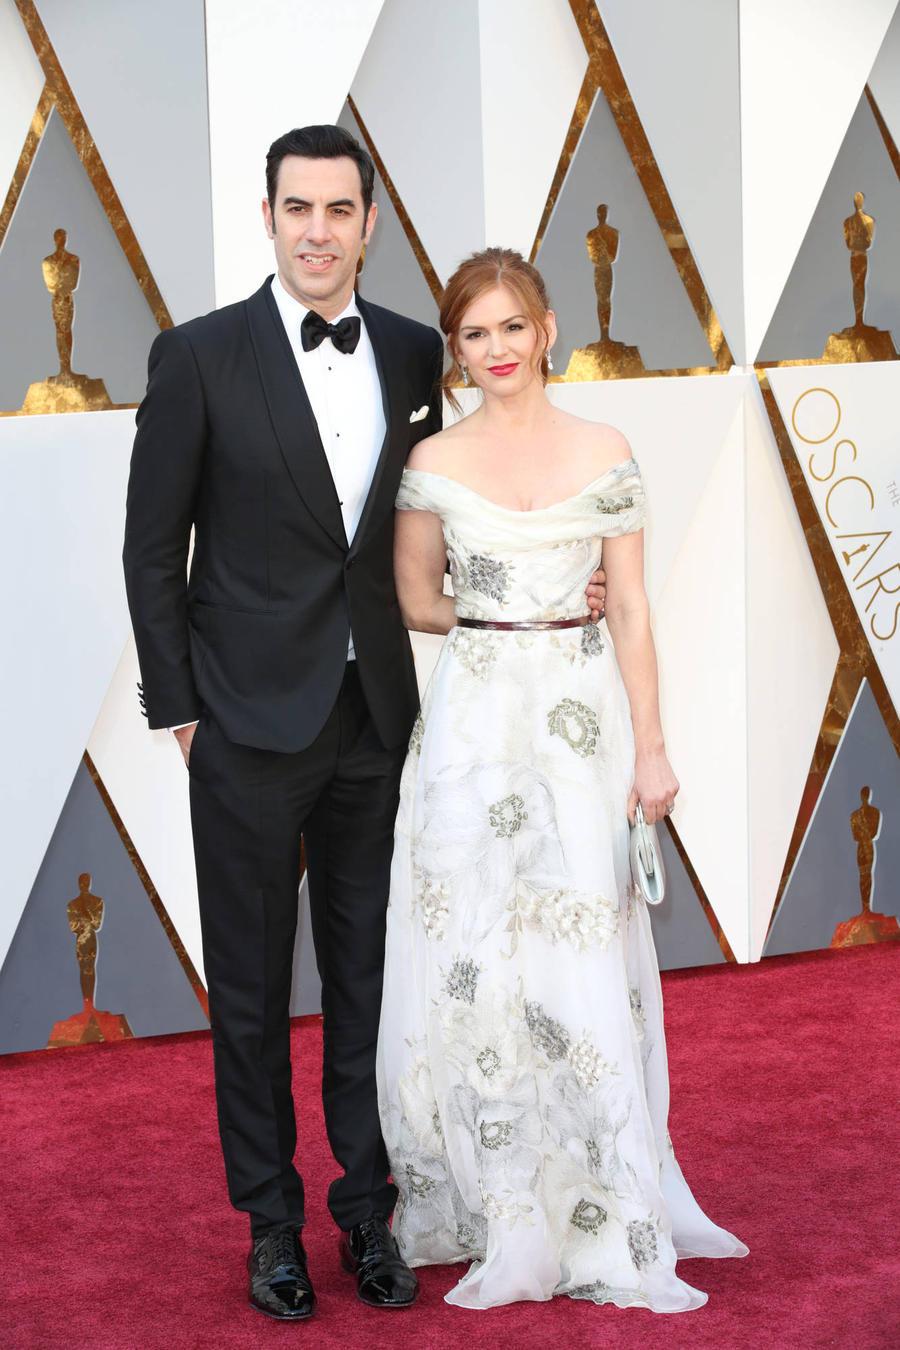 Sacha Baron Cohen Sneaked Ali G Costume Into Oscars